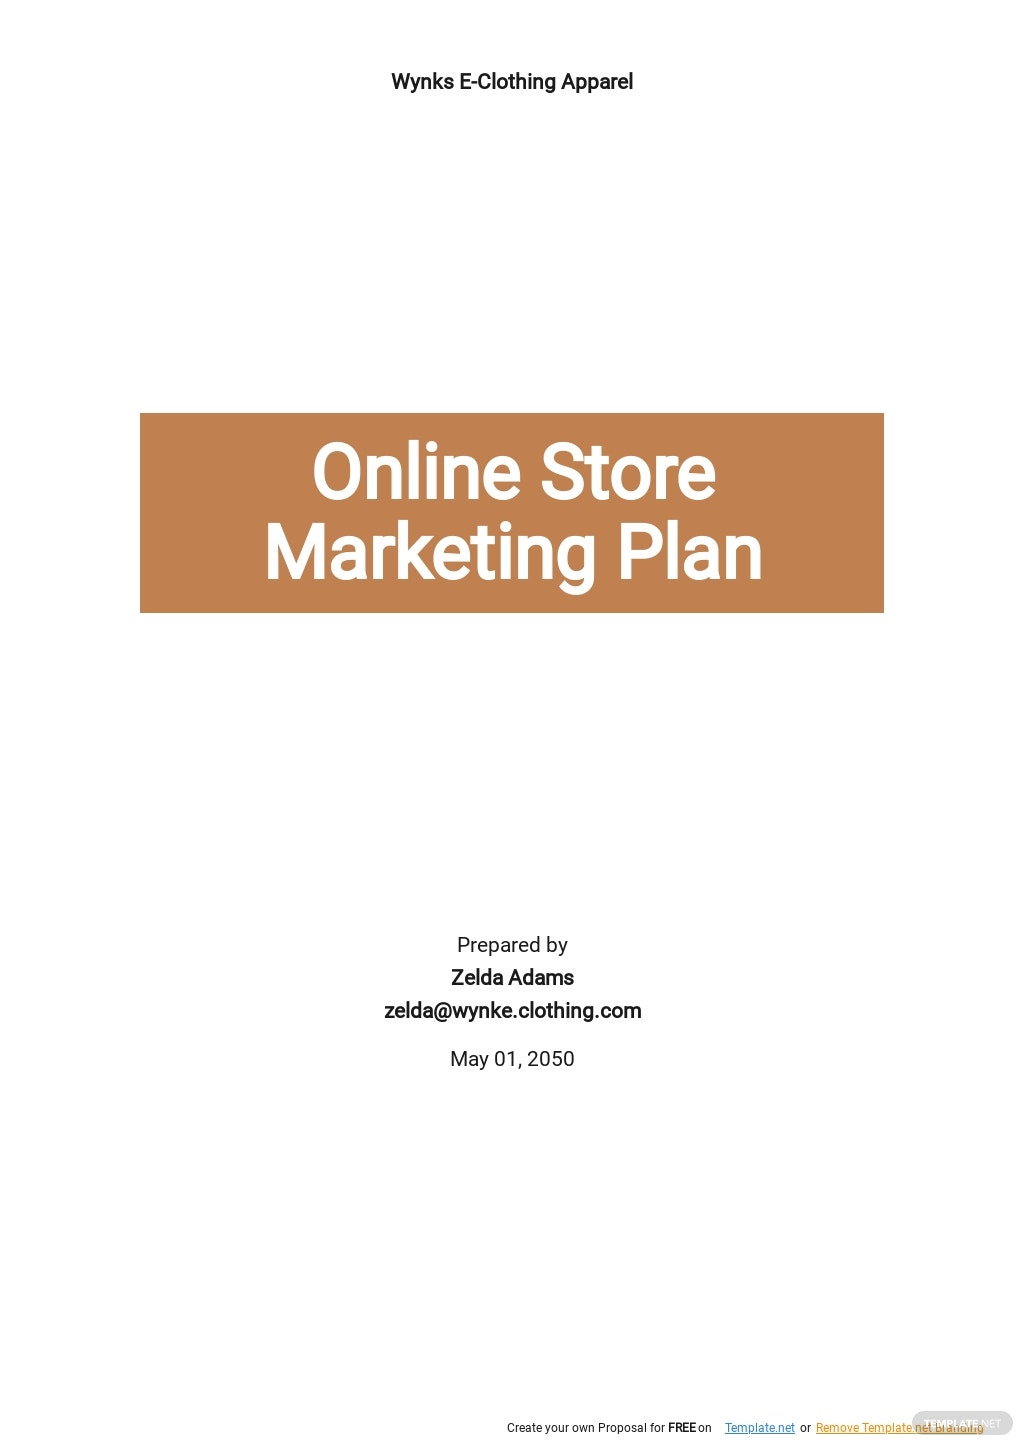 Online Store Marketing Plan Template.jpe